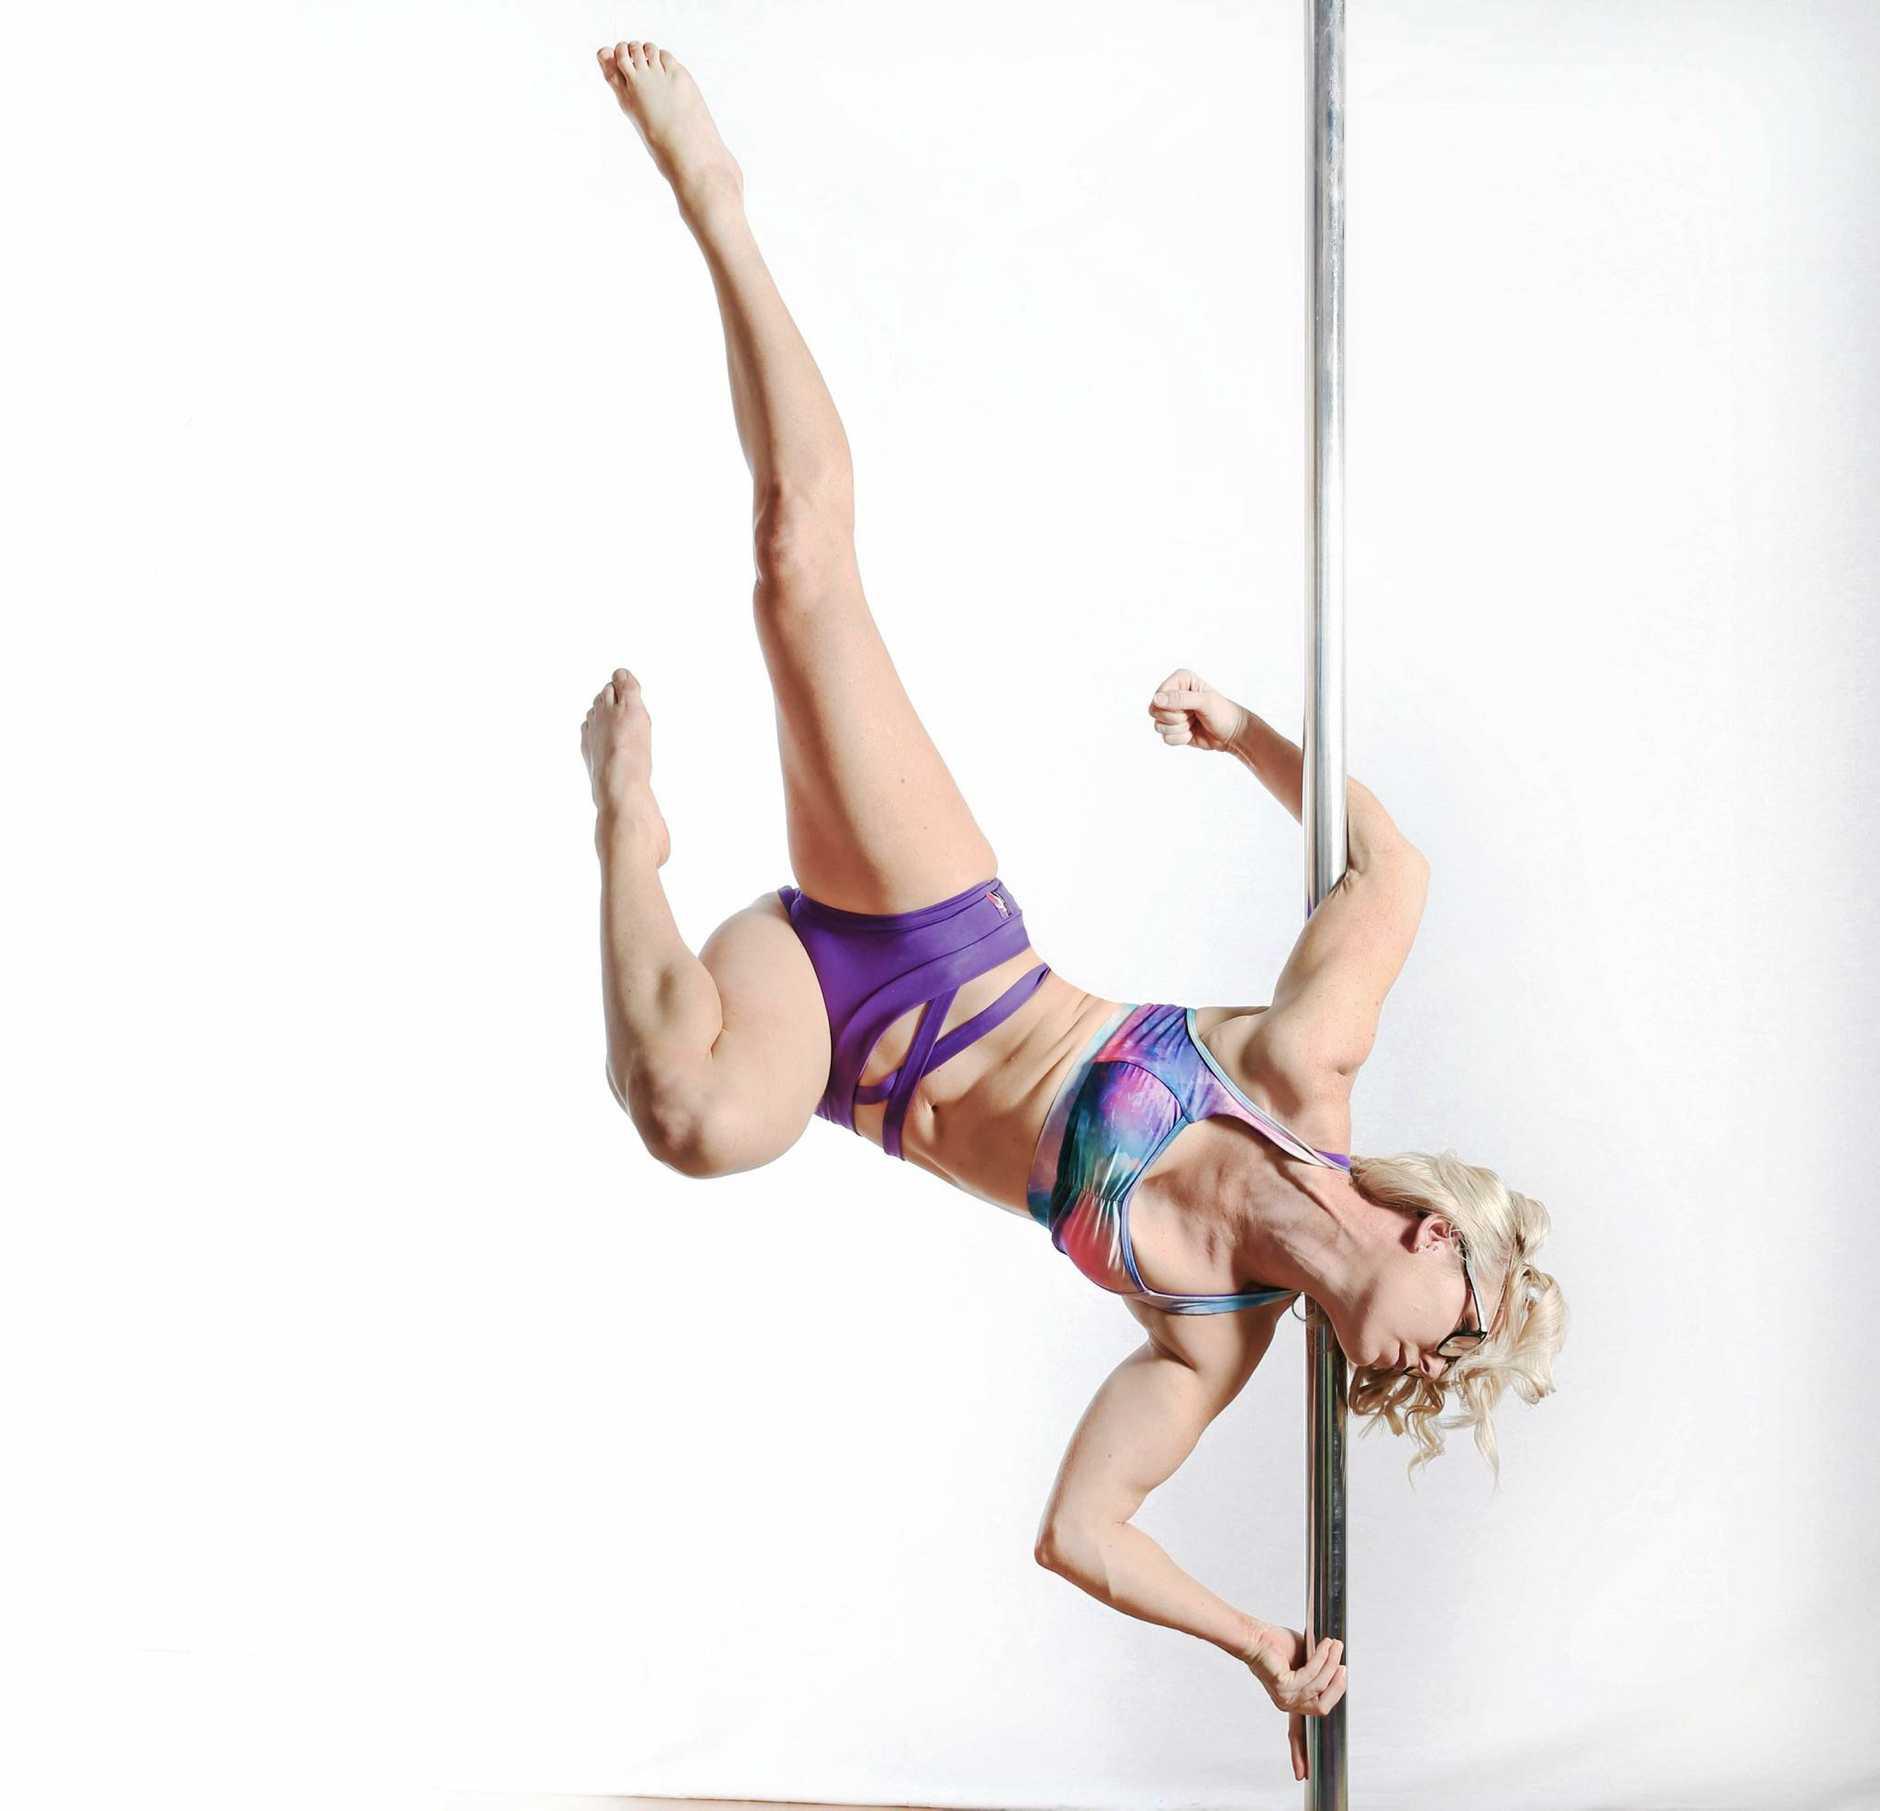 FEATS OF STRENGTH: Tamara MacKenzie will compete in Brisbane this weekend in Miss Pole Dance Queensland Heats.